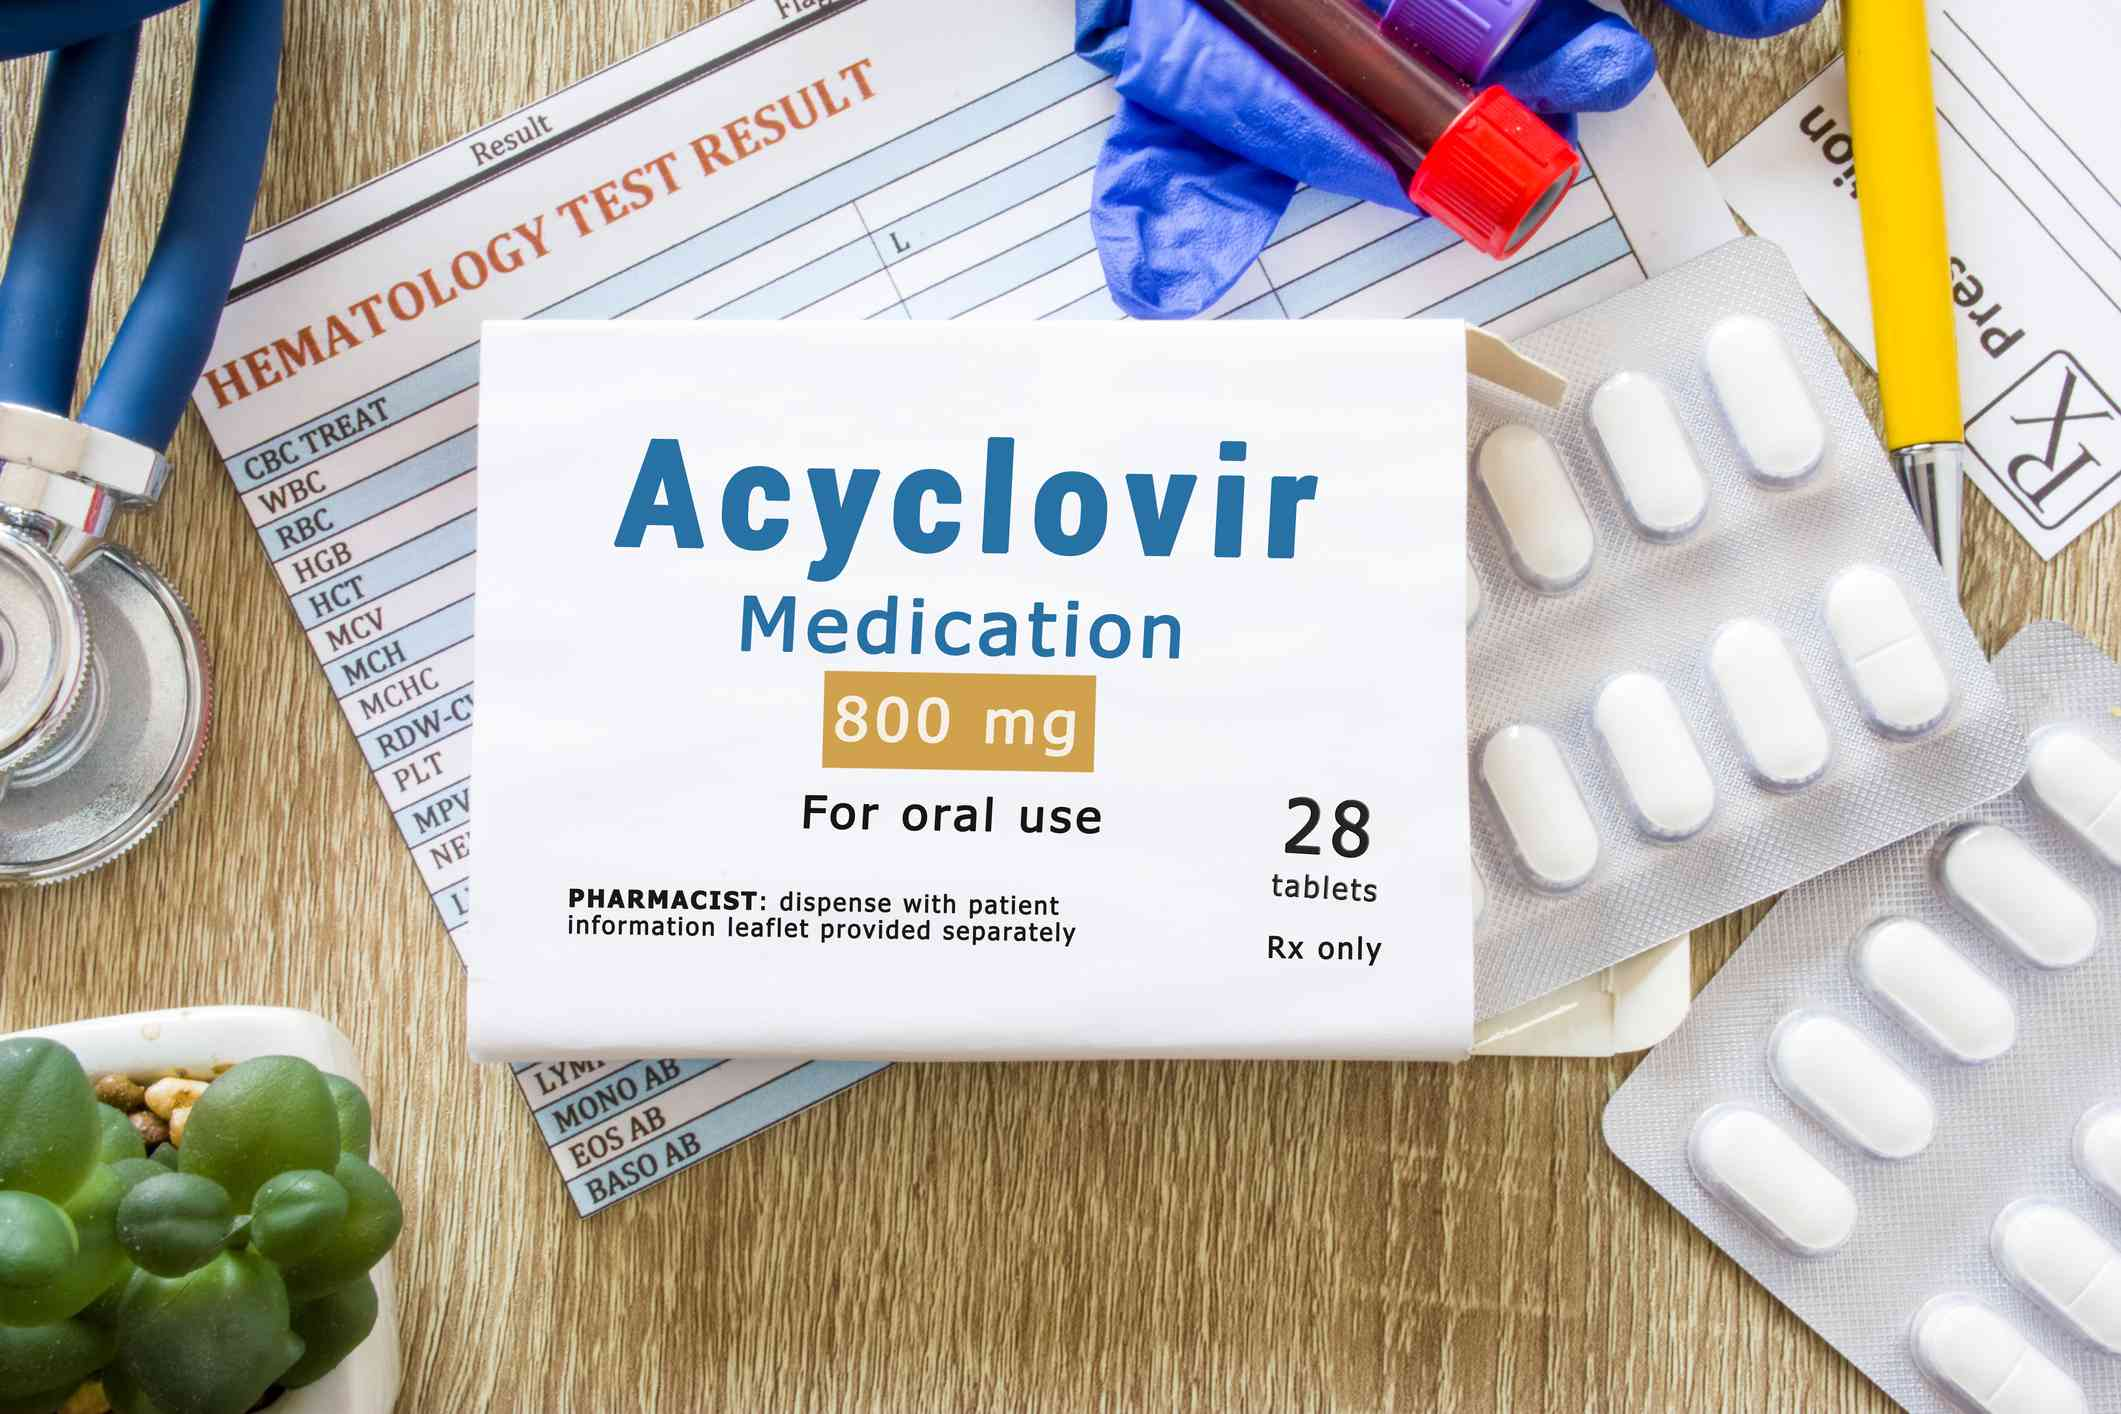 meningoencephalitis is often viral and may be treated with acyclovir